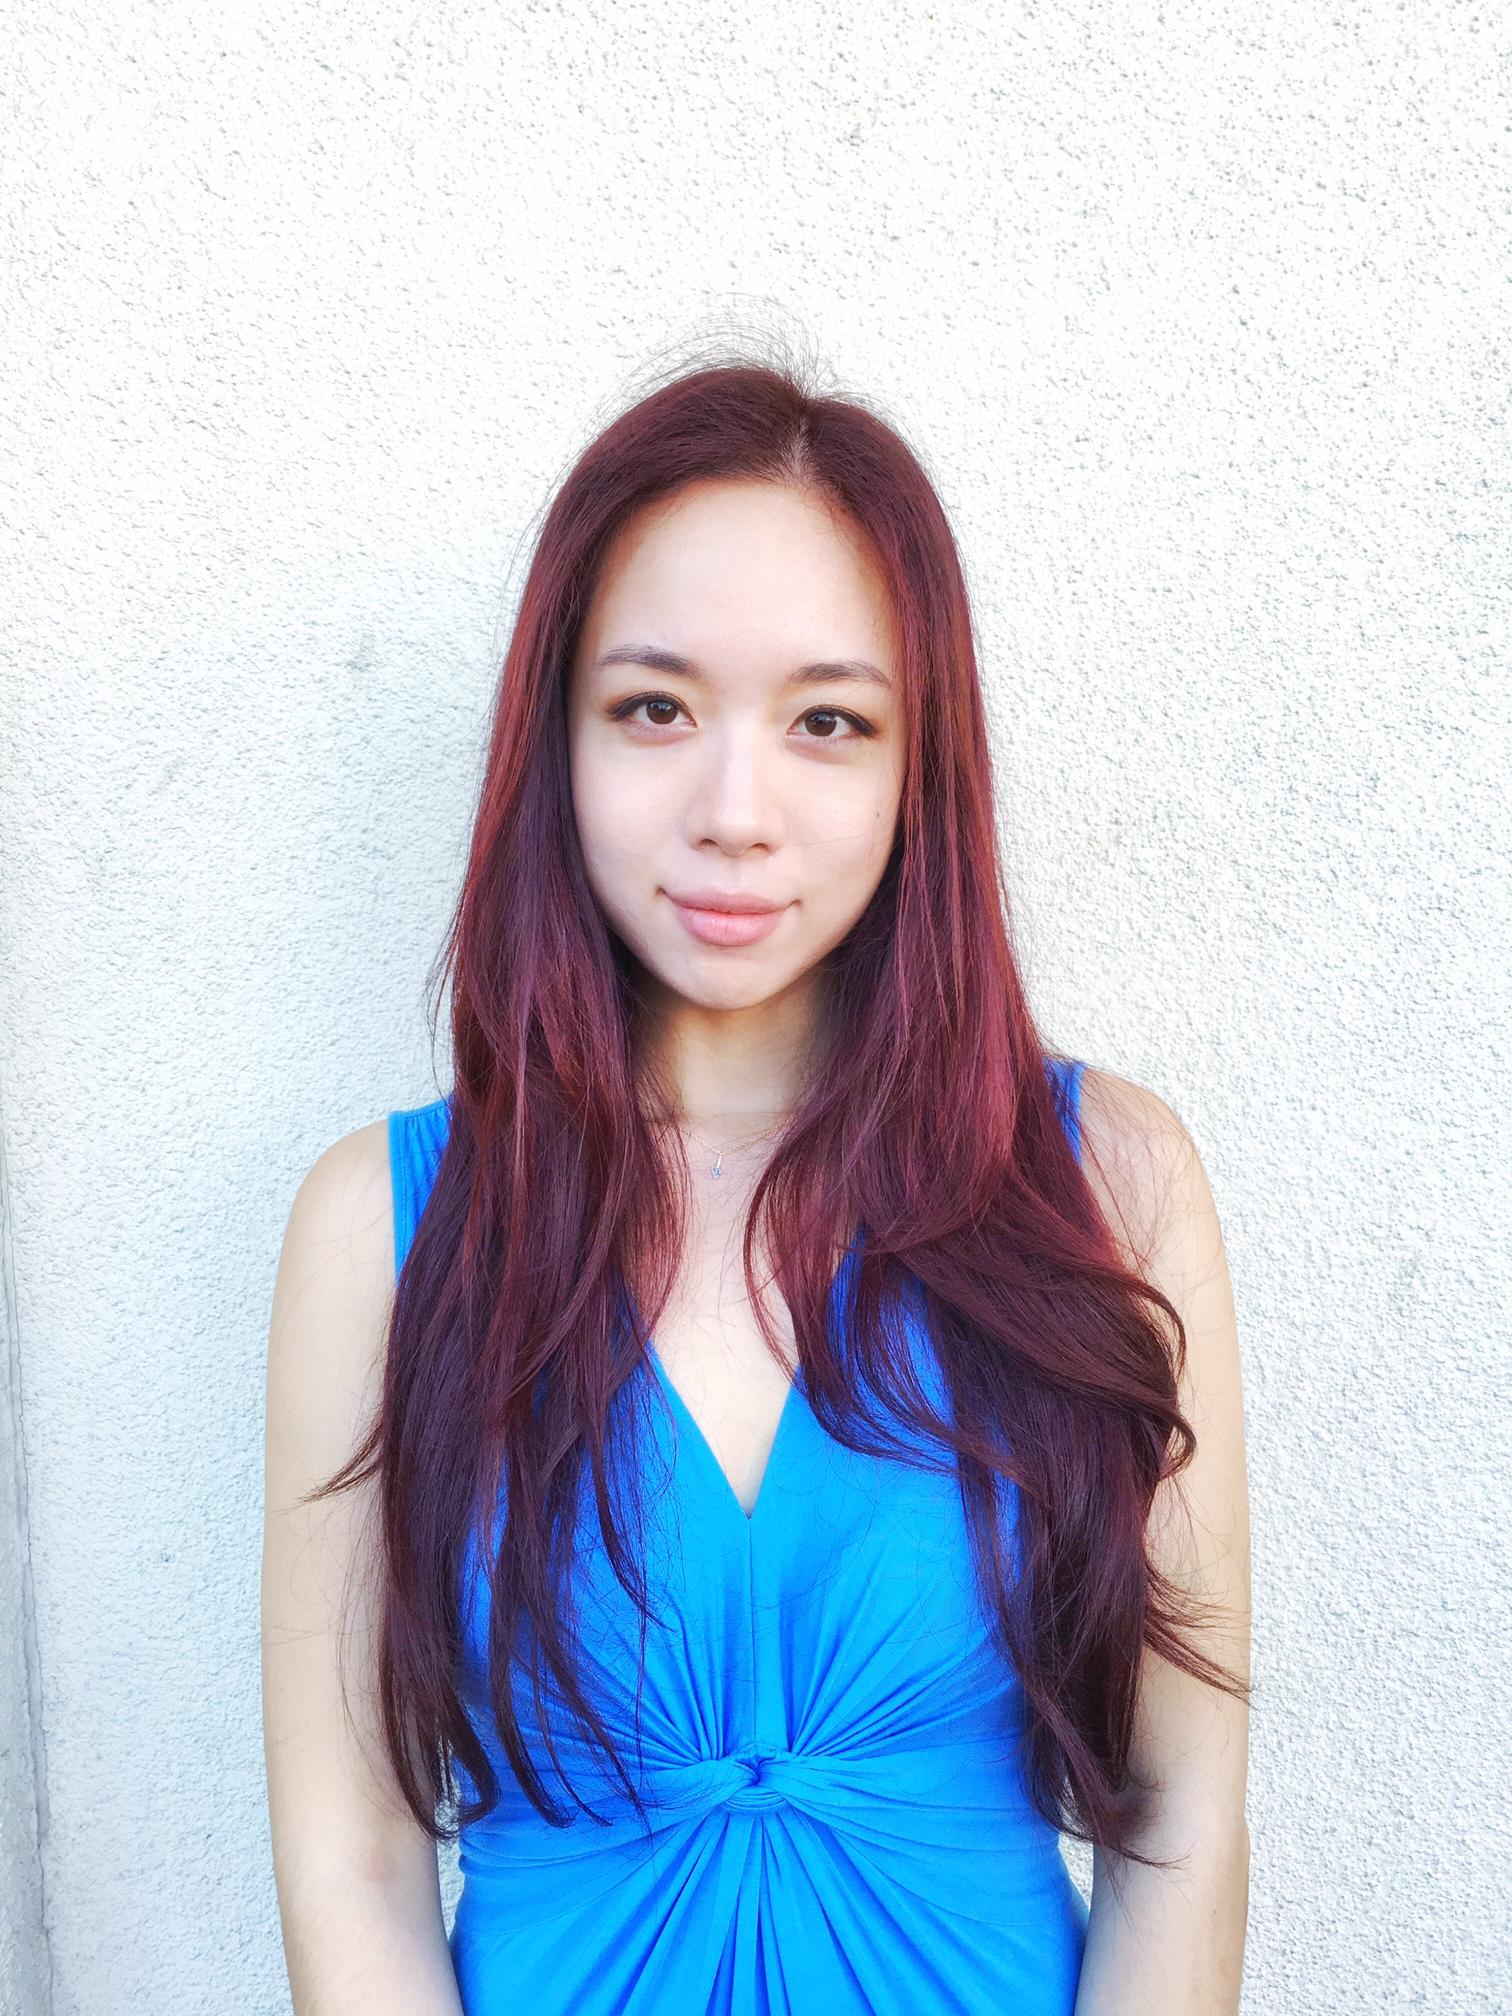 Jessica - Los Angeles